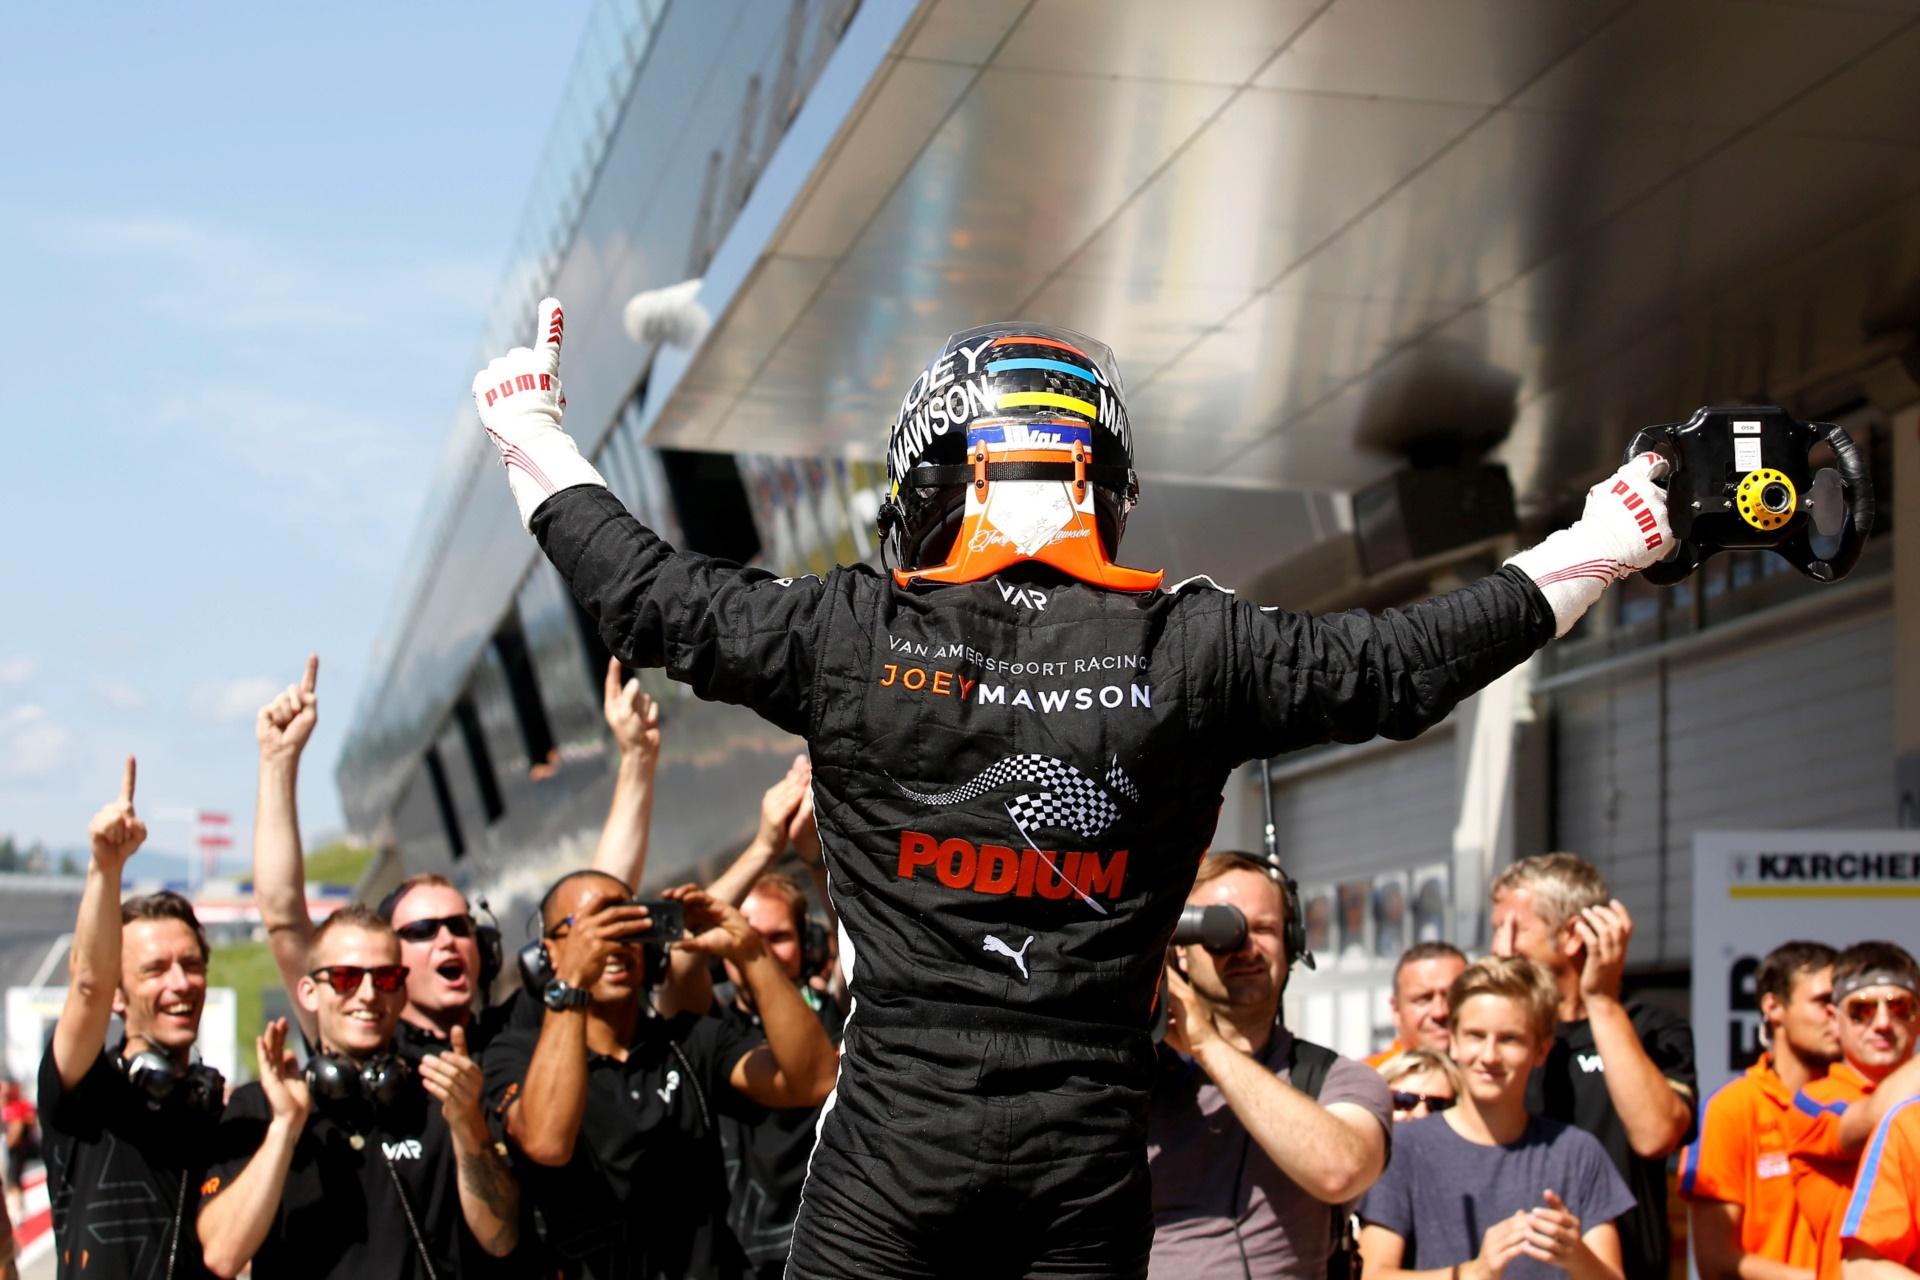 Joey Mawson celebrates with the Van Amersfoort Racing AV team